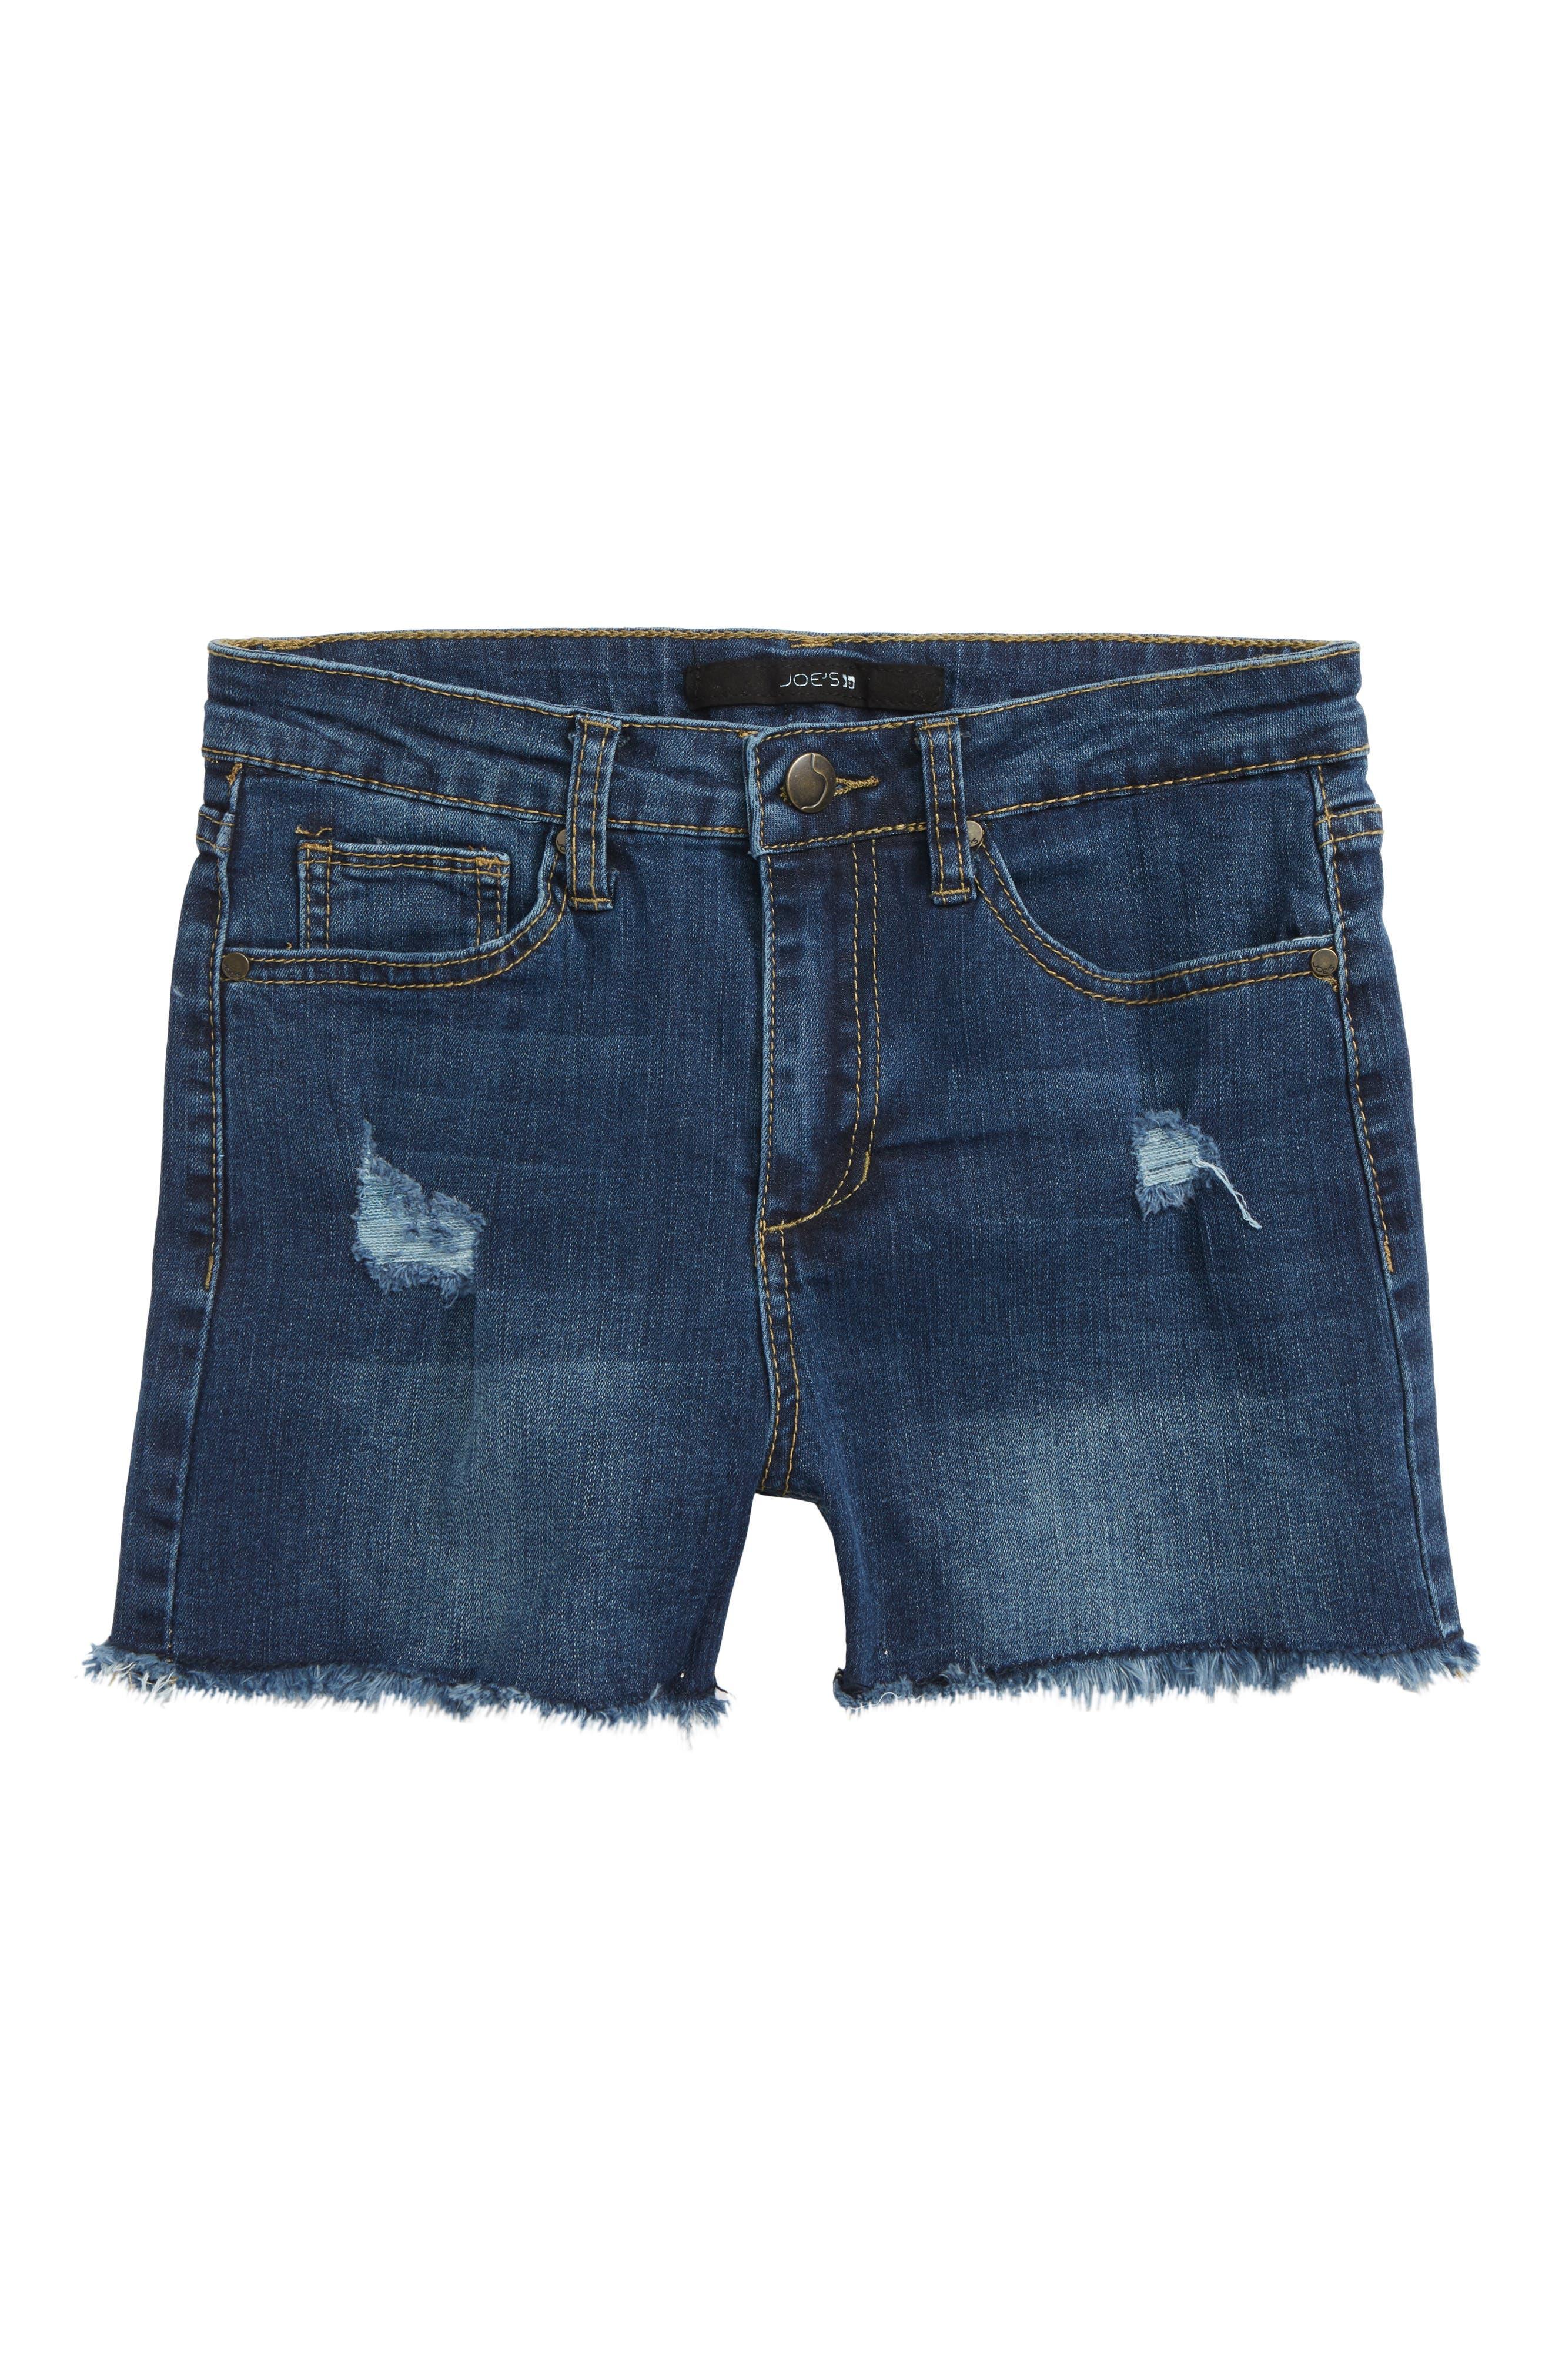 Charlie High Waist Cutoff Shorts,                             Main thumbnail 1, color,                             401